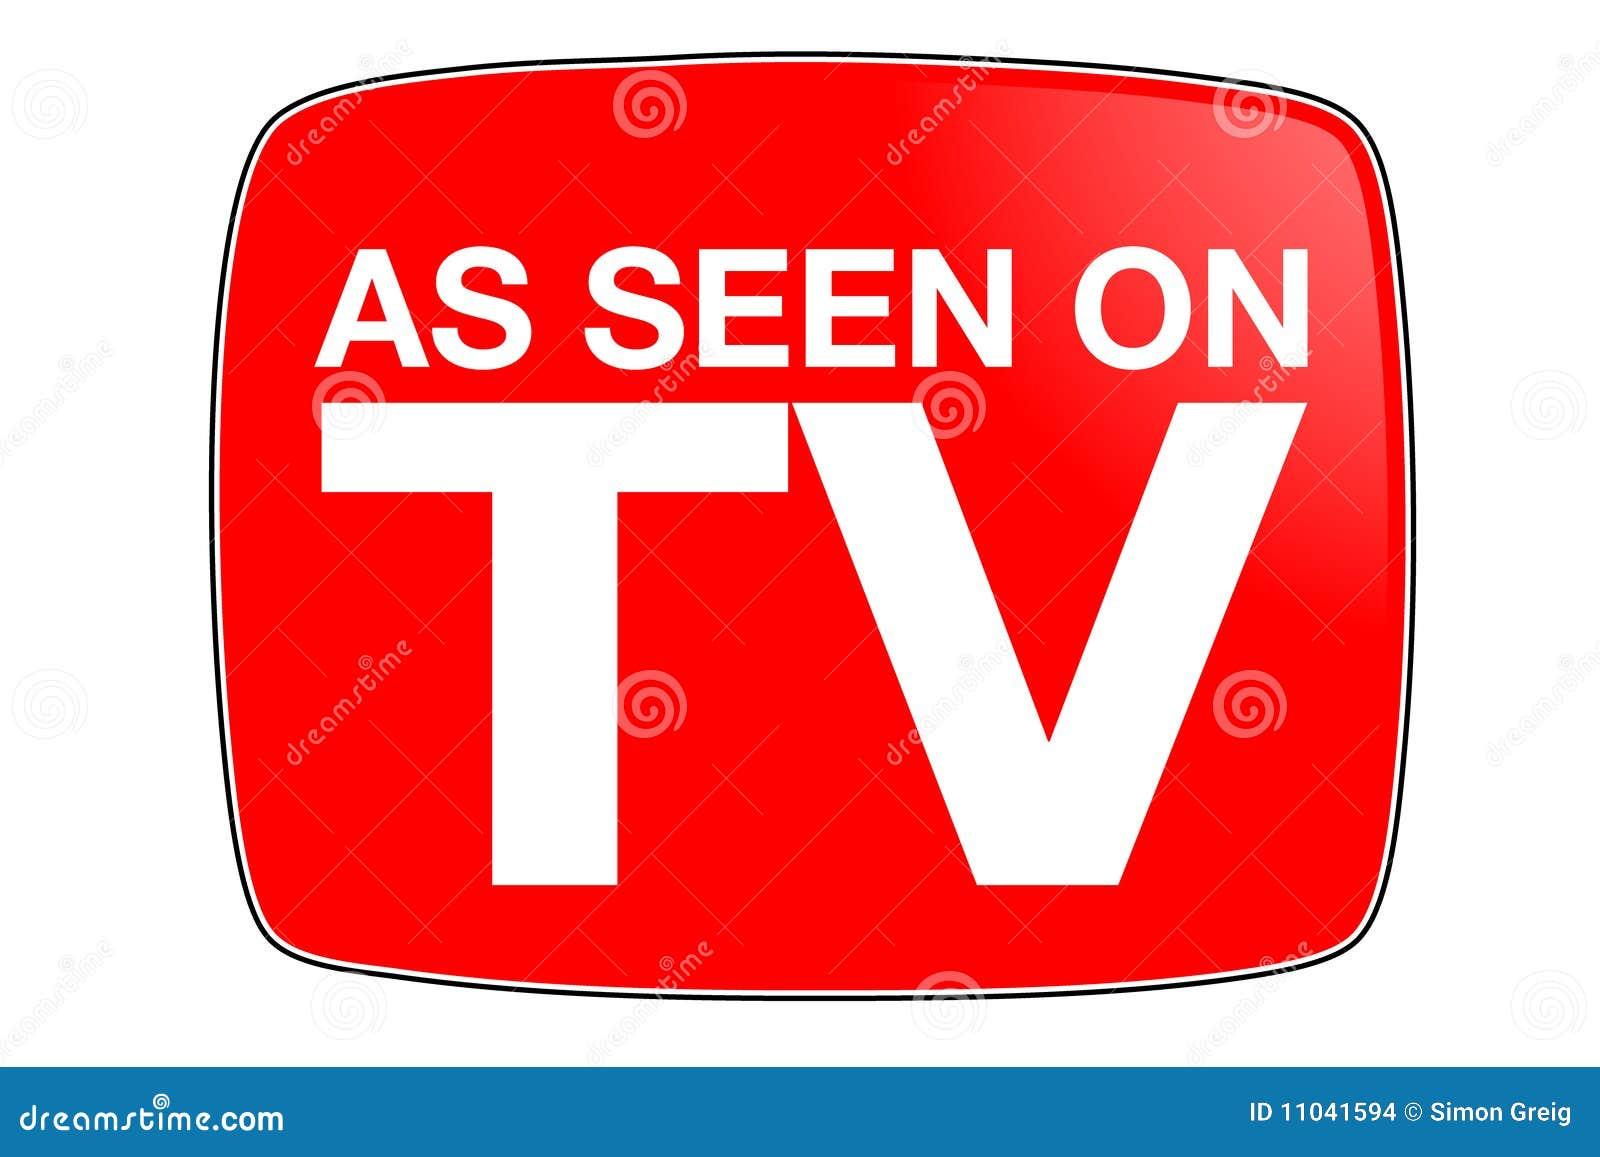 as seen on tv icon stock illustration illustration of icon 21905266